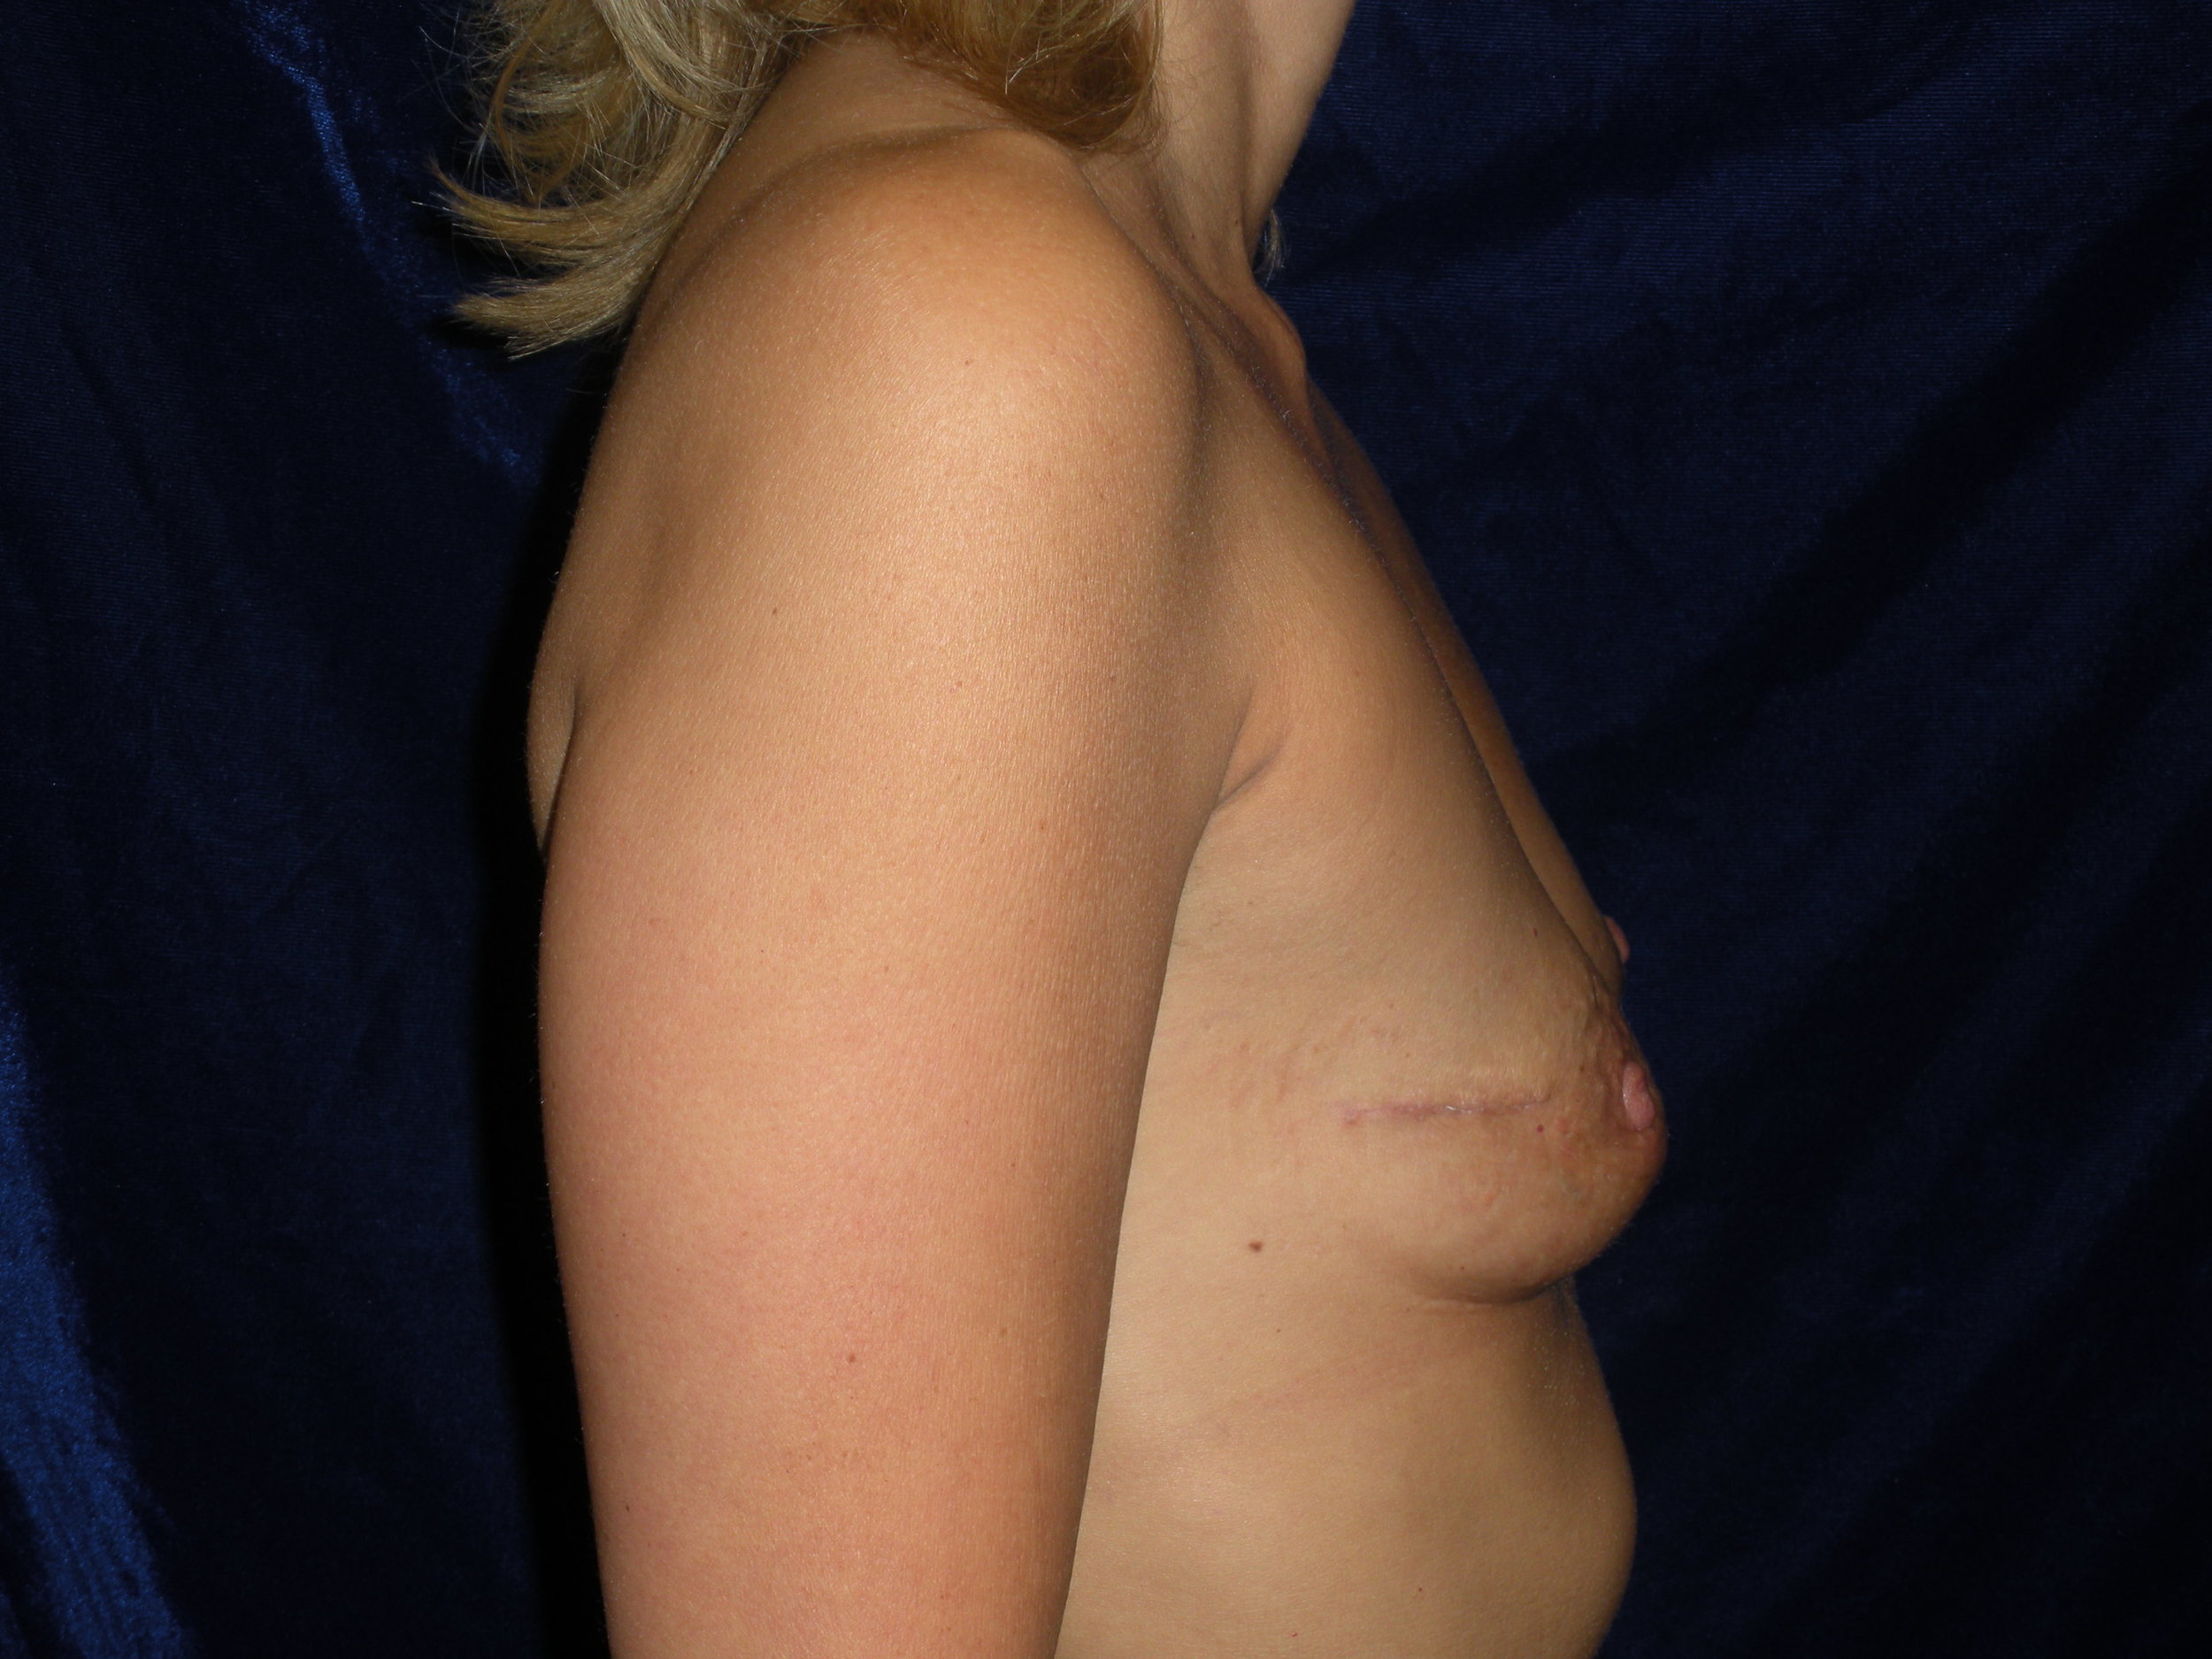 beckerplasticsurgery_breastreconstruction_breastsurgery_breastjob_beforeandafter_plasticsurgeon_selfcare_bismarck (20).JPG